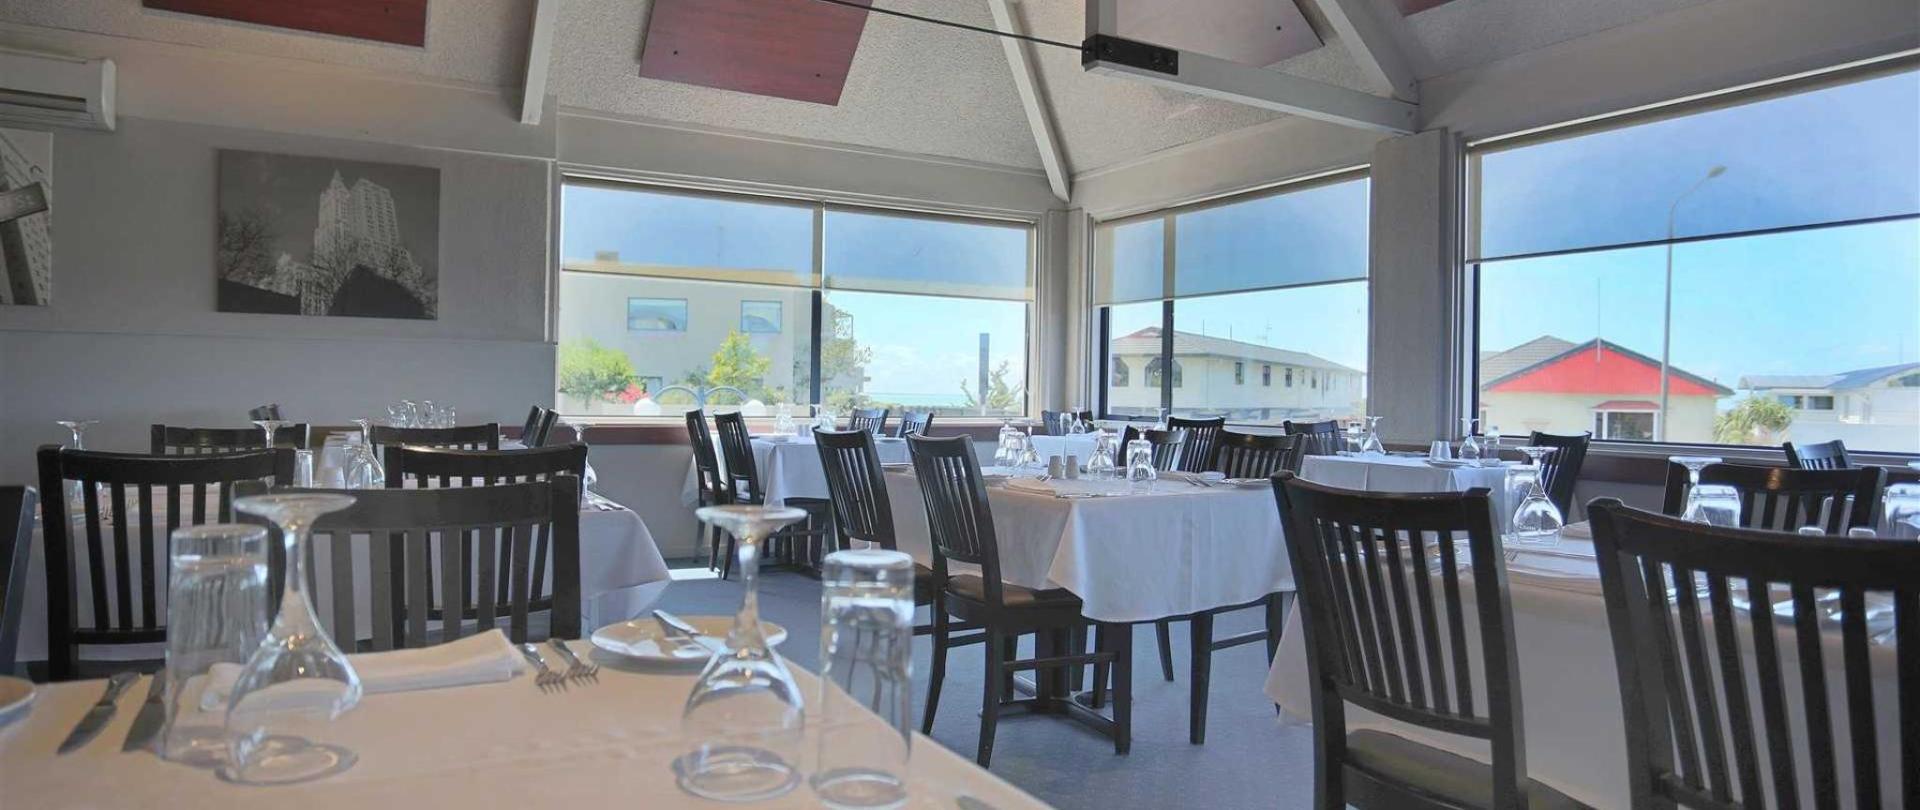 nz147_ch_benvenue_restaurant_view2_241115.jpg.1920x1080_default.jpg